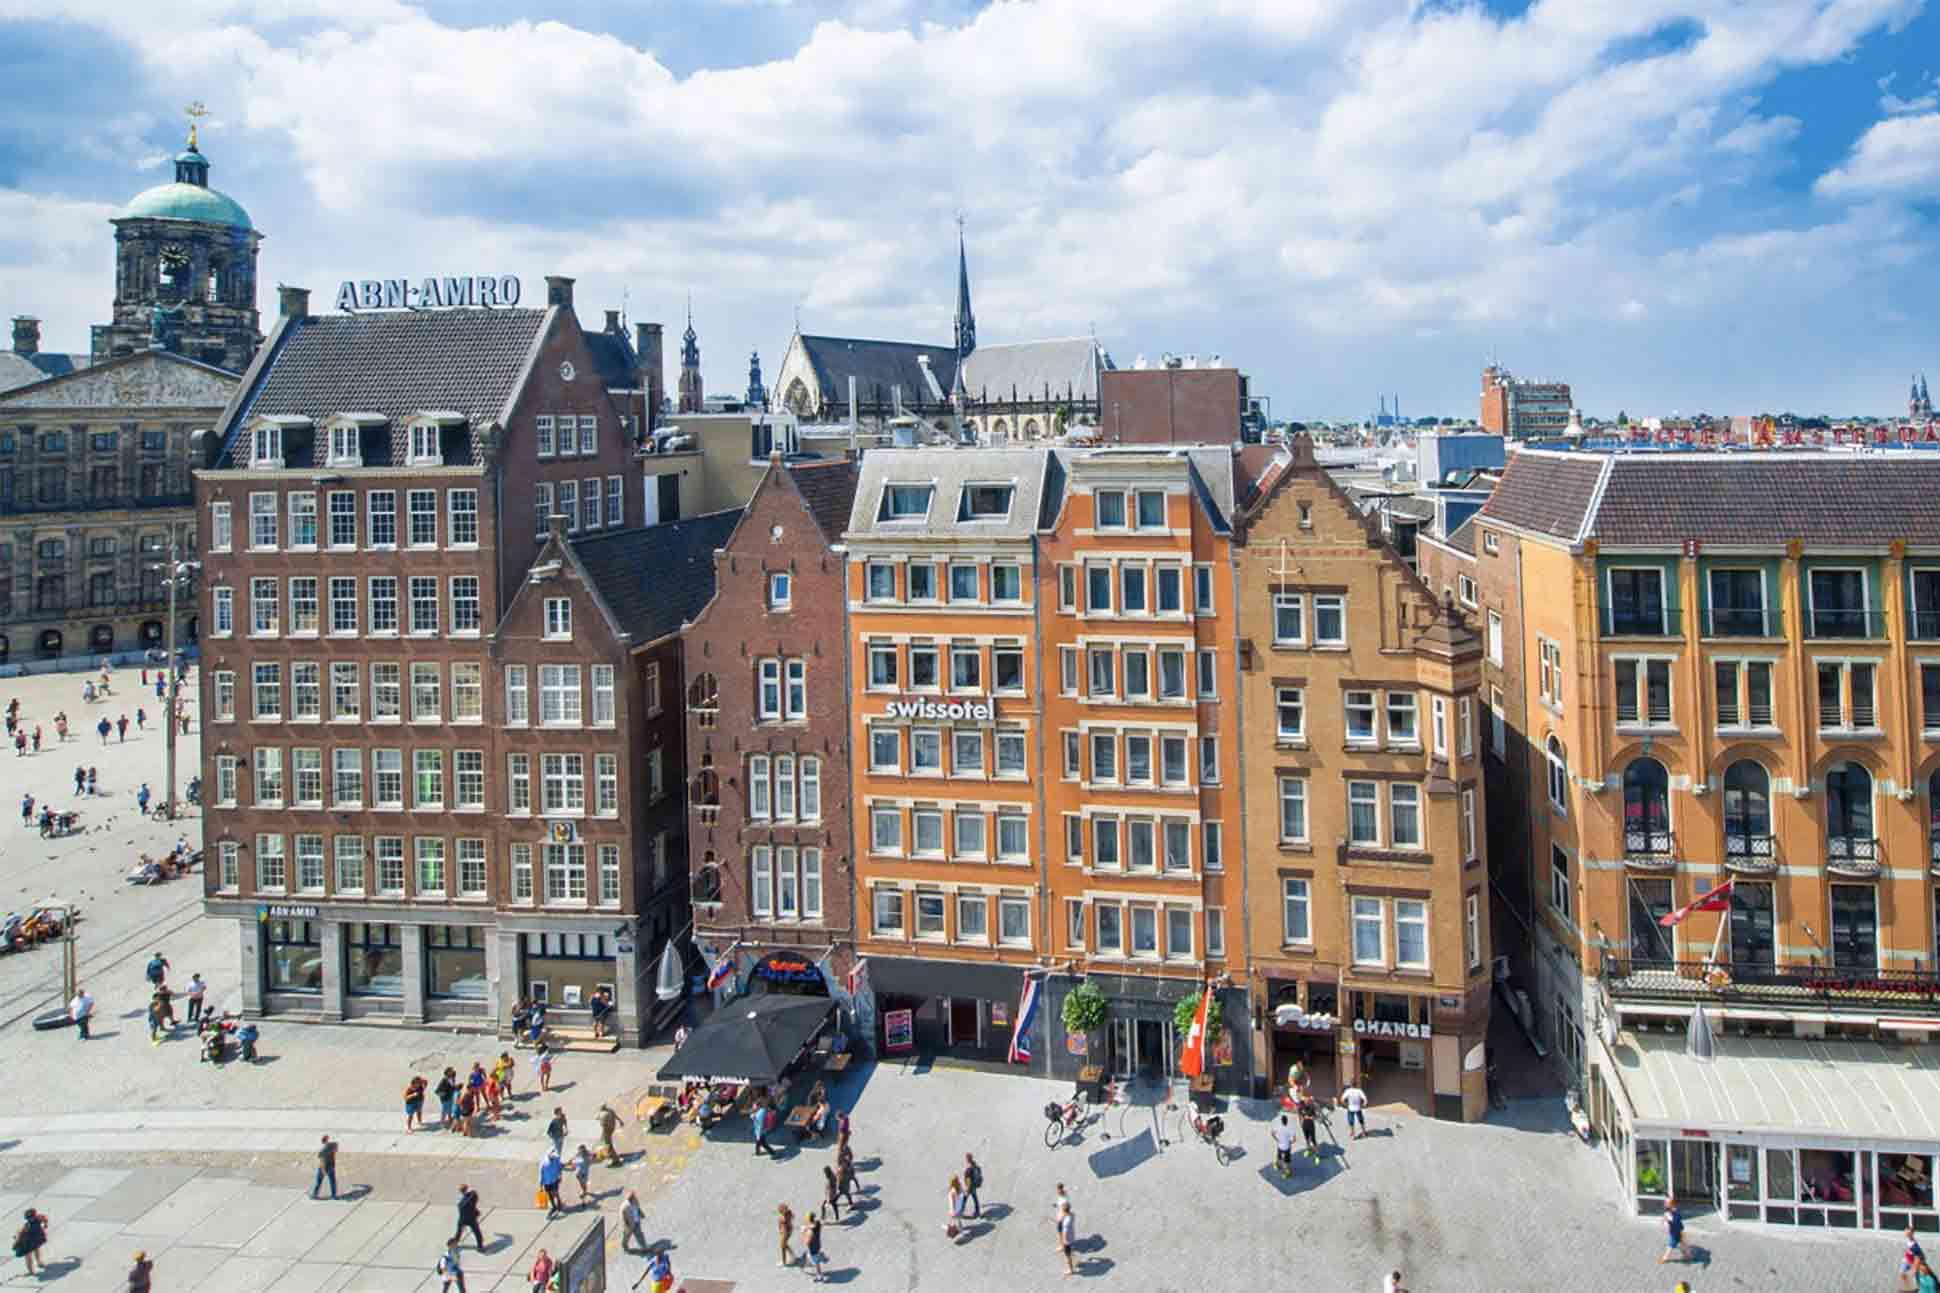 Swissotel, Amsterdam, Netherlands